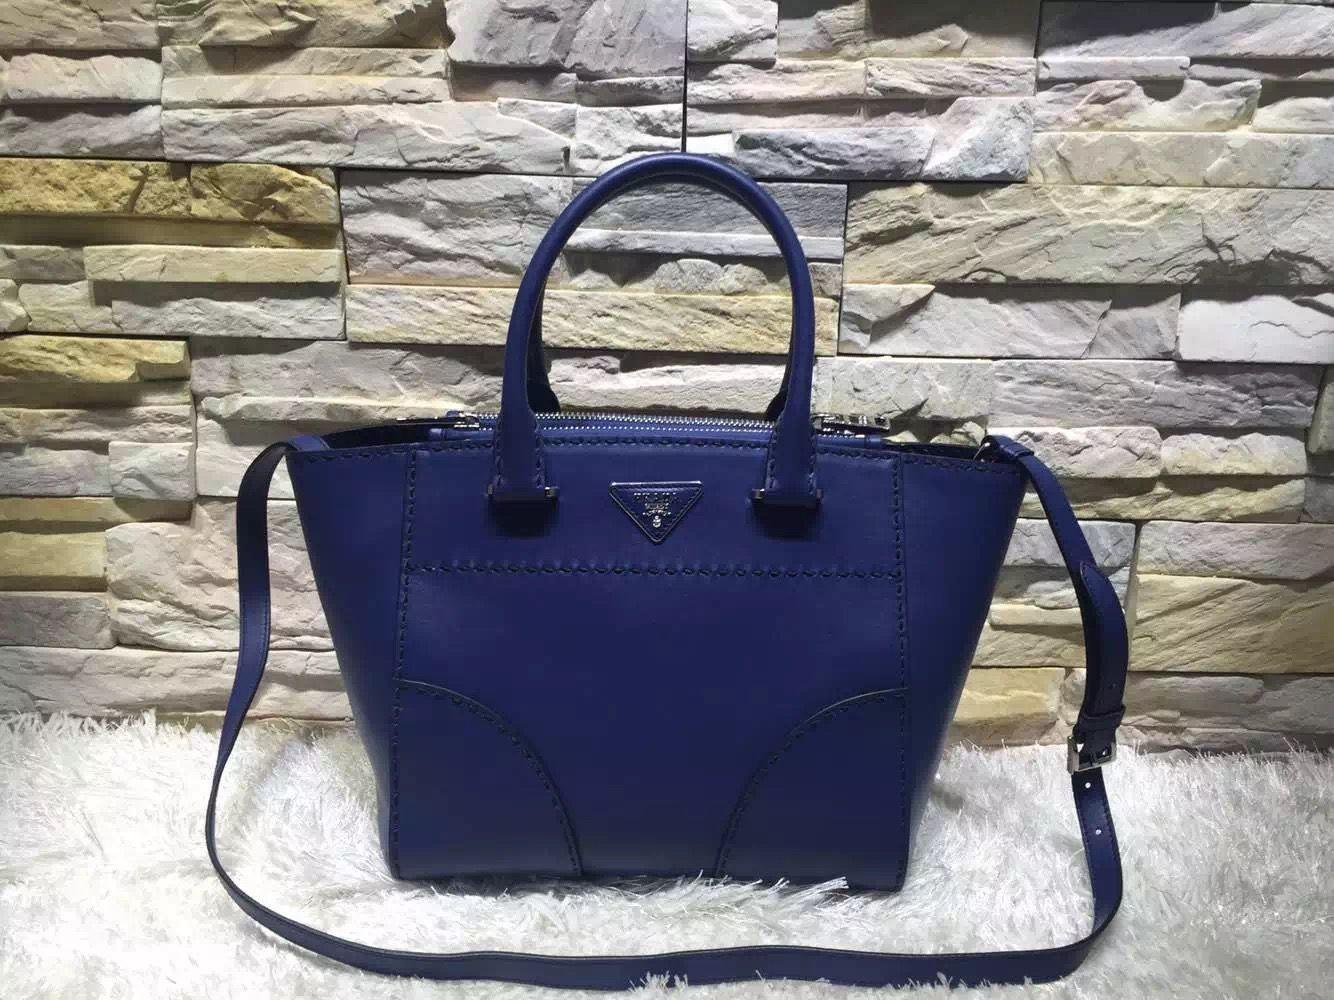 6560a0f439 Prada Hand-stitched City Calf Leather Tote B2861K Blue 2015 Prada Tote Bag